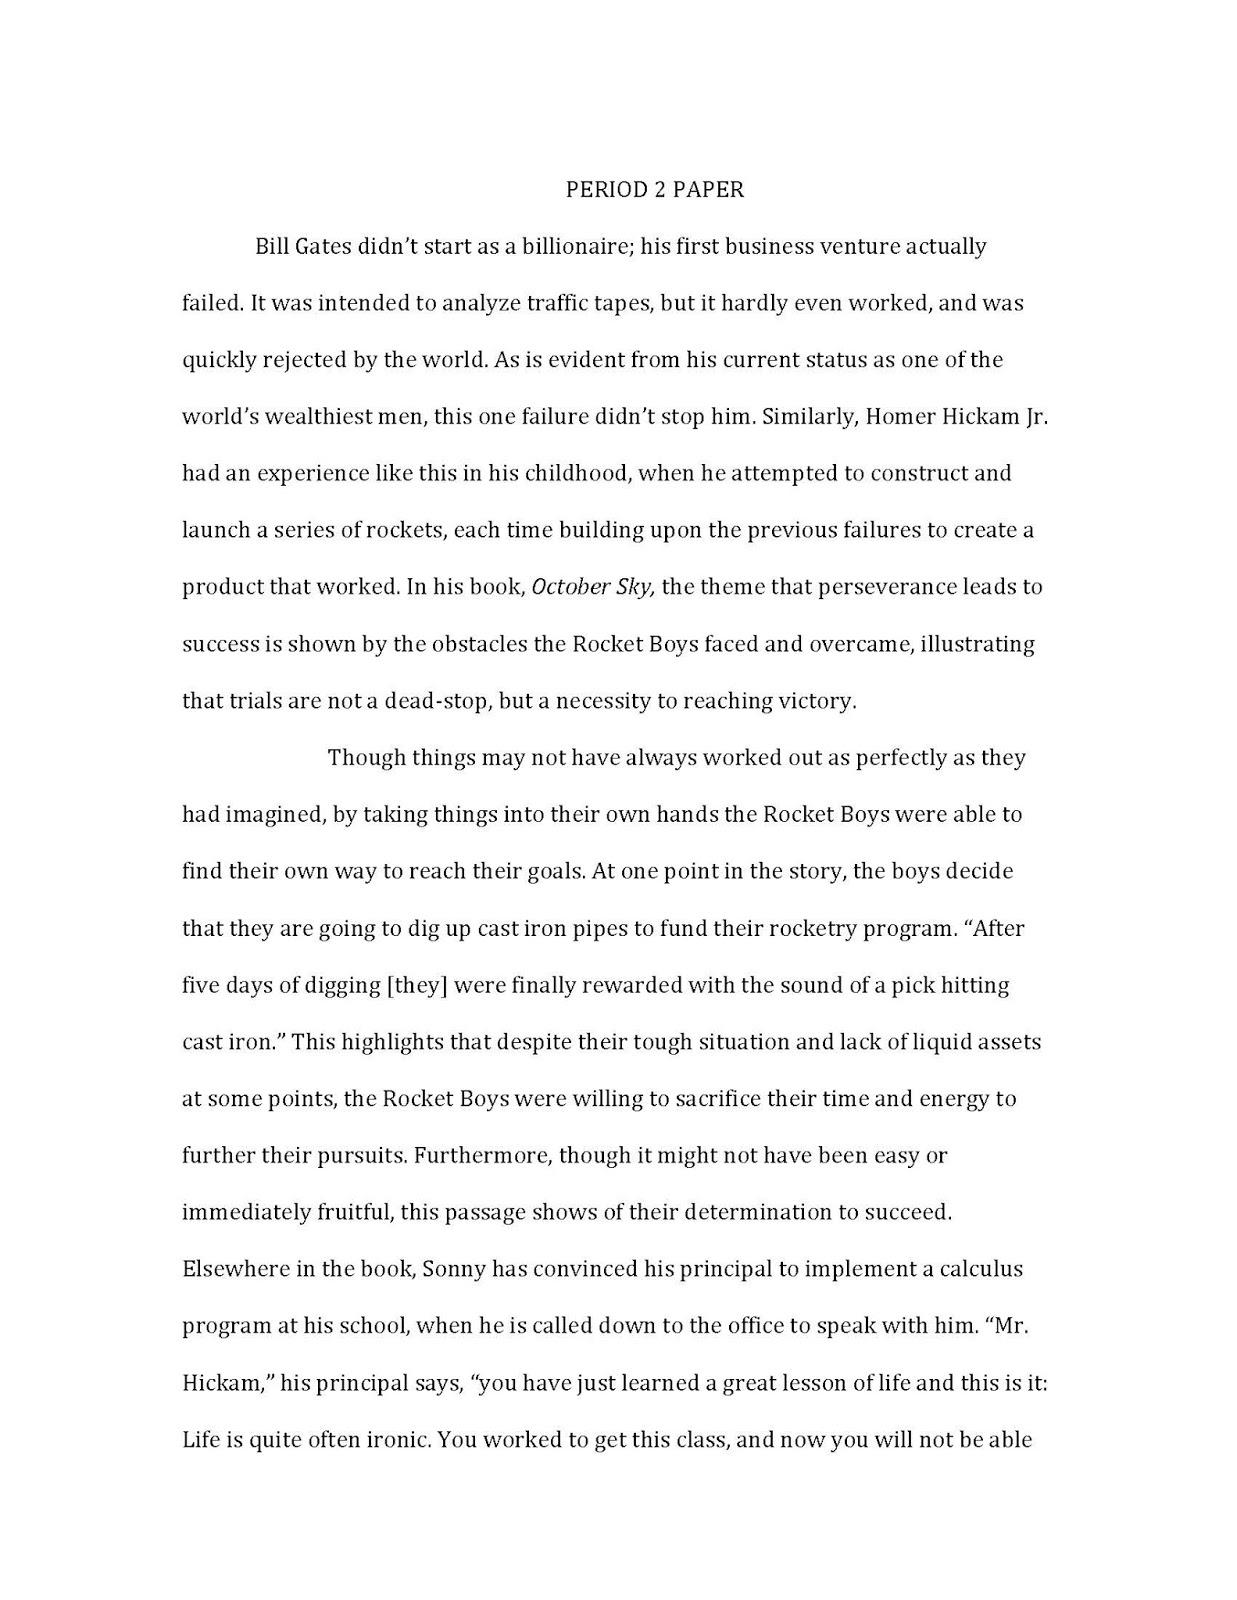 speech analysis essay websites that write essays for you cambridge websites that write essays for you cambridge